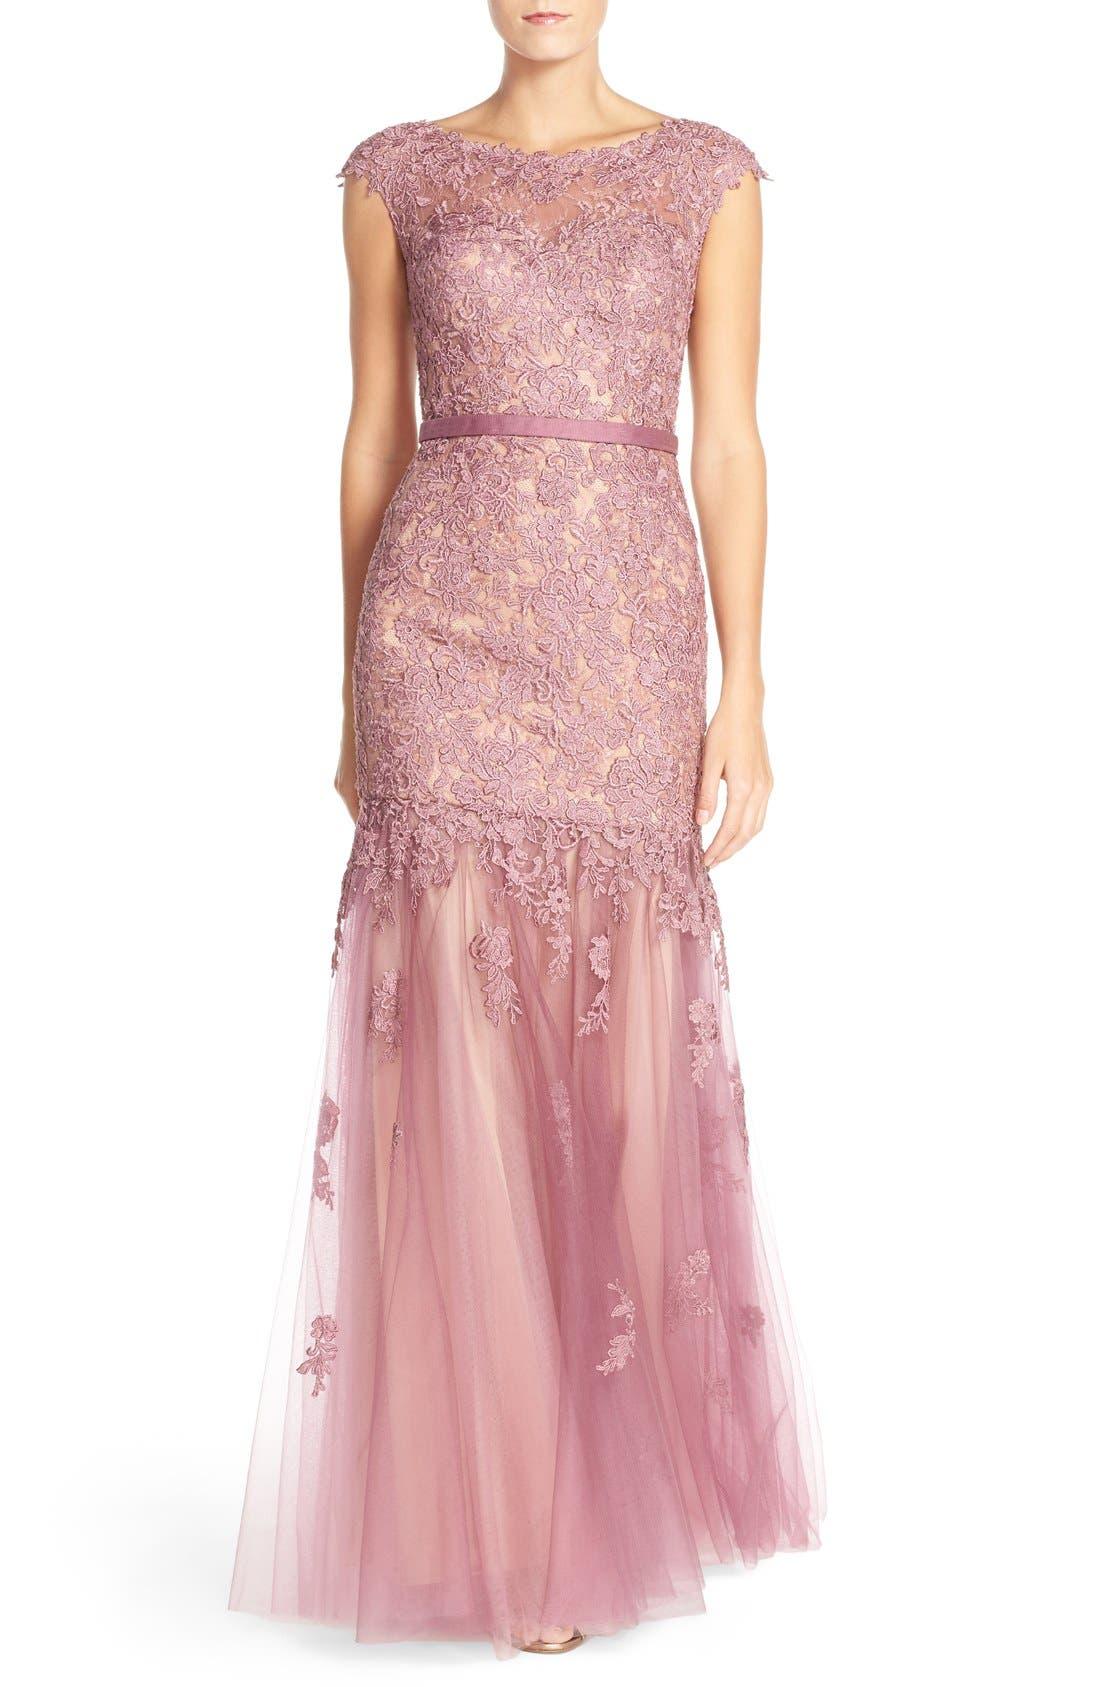 LA FEMME Lace & Tulle Mermaid Gown